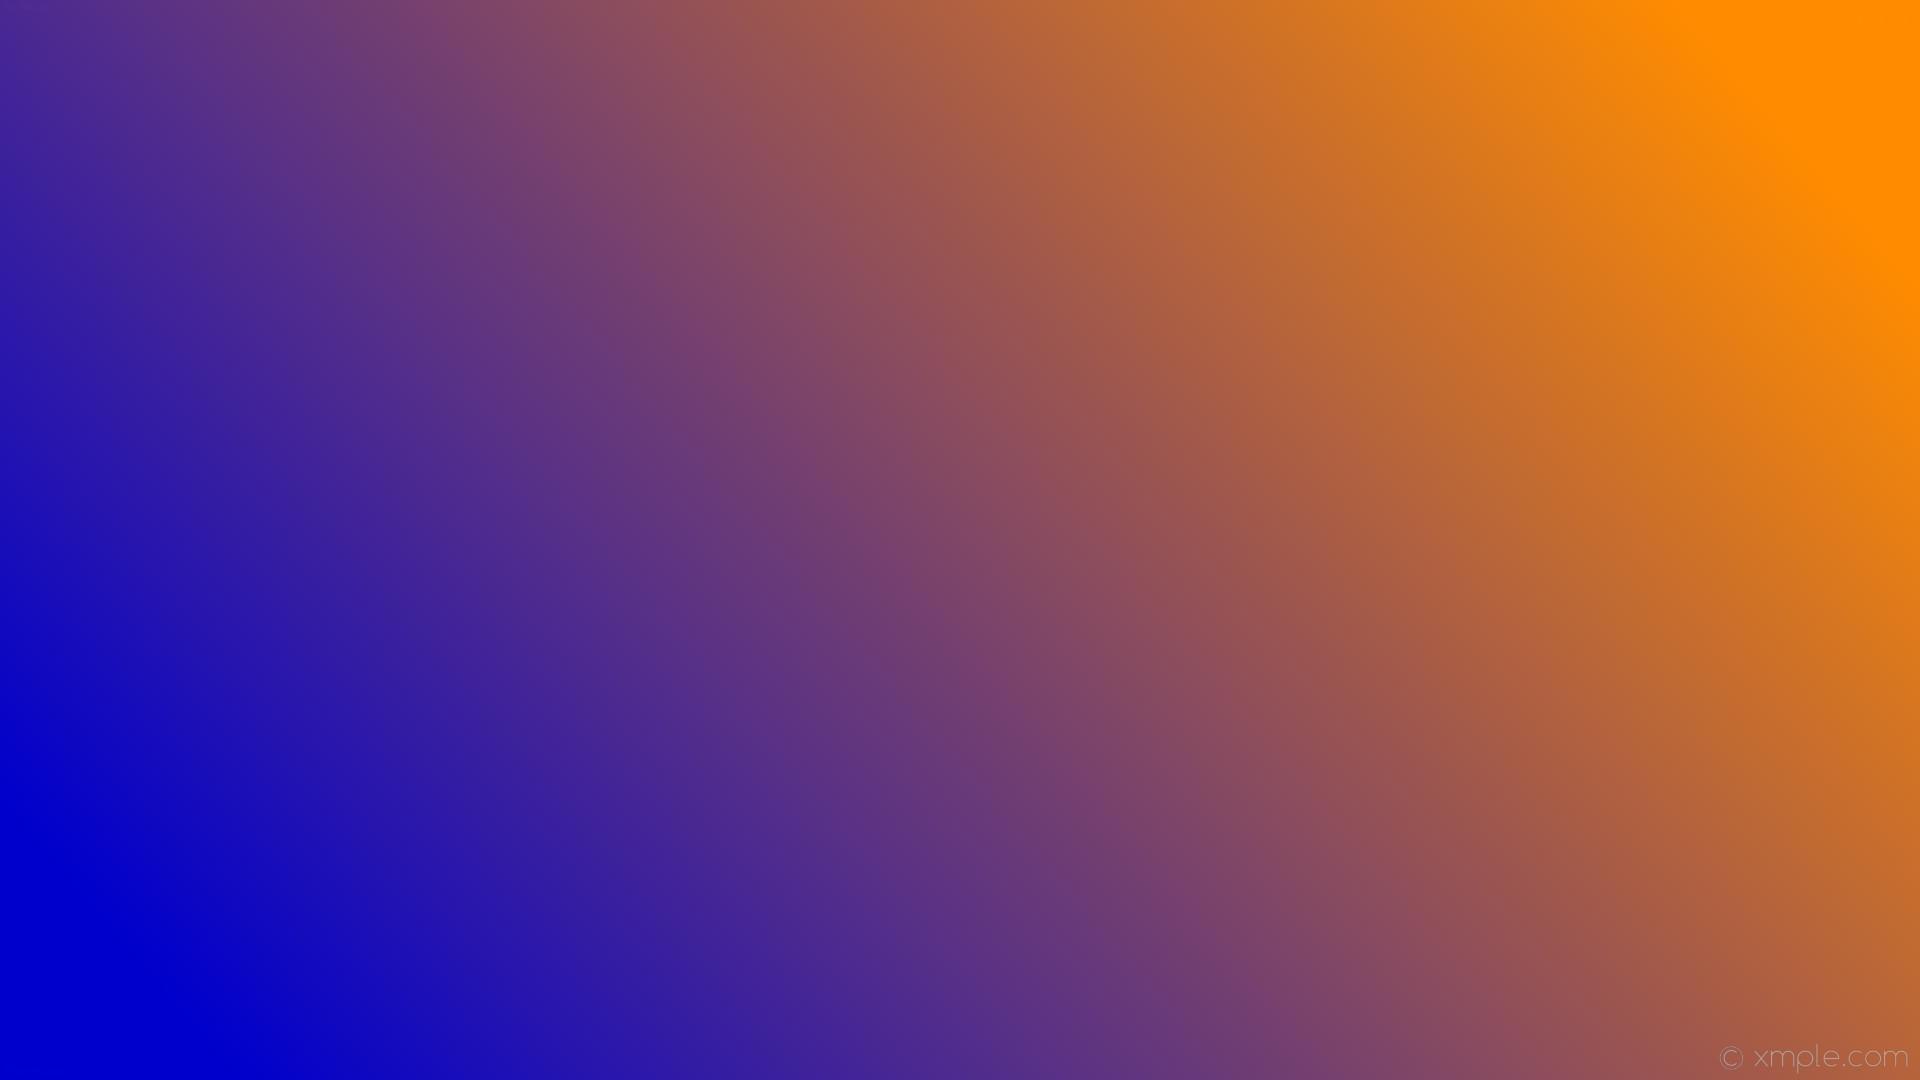 wallpaper linear orange gradient blue dark orange medium blue #ff8c00  #0000cd 15°